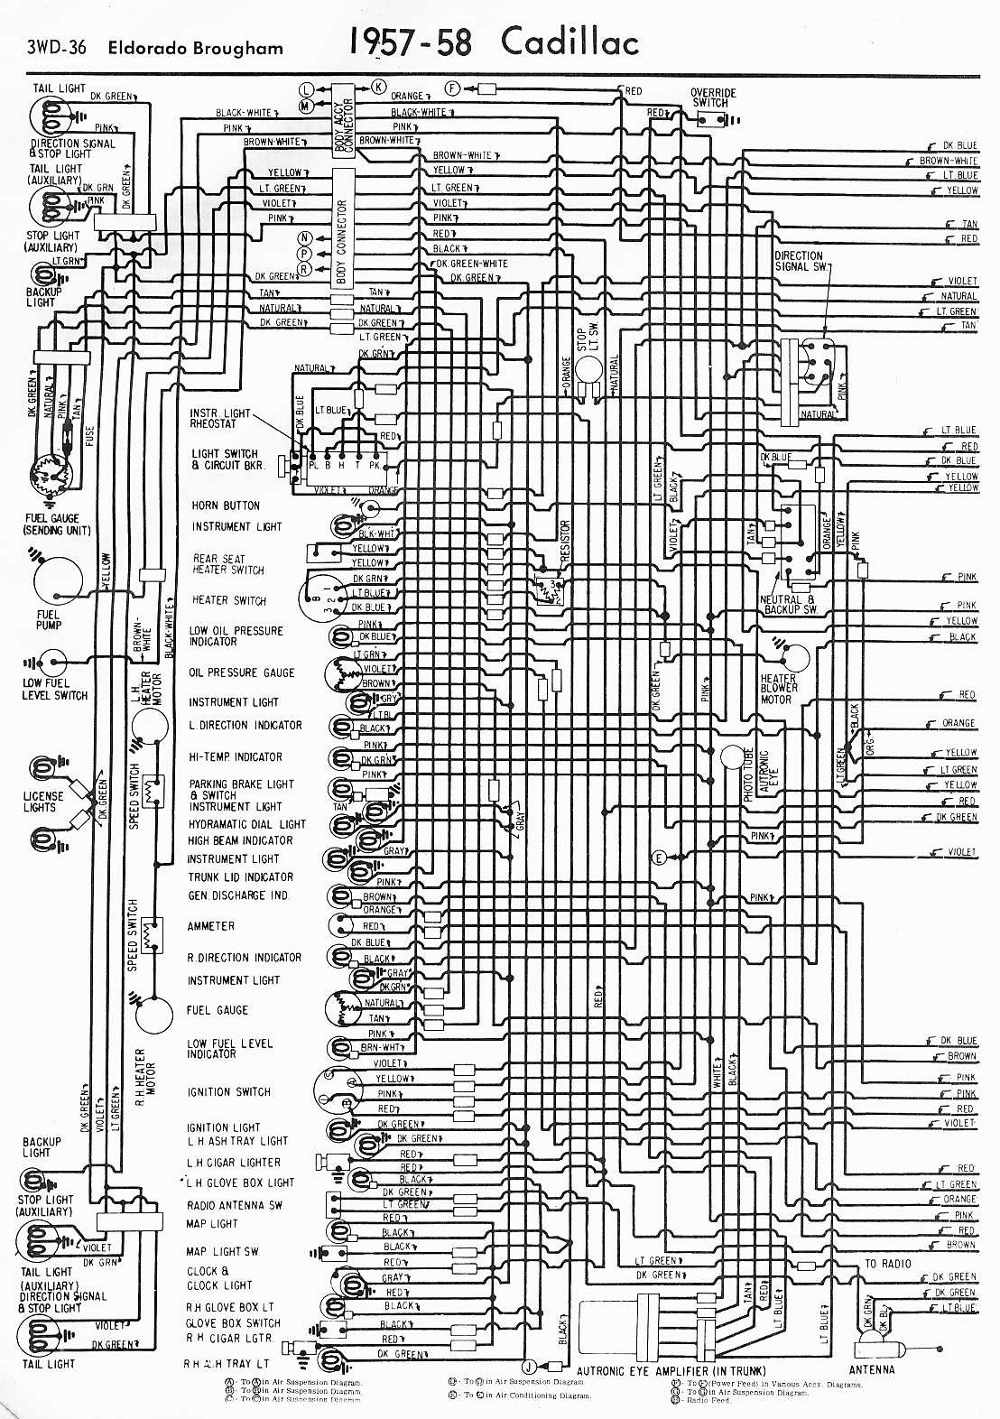 1950 cadillac wiring schematic free cadillac wiring diagrams general wiring diagrams  free cadillac wiring diagrams general